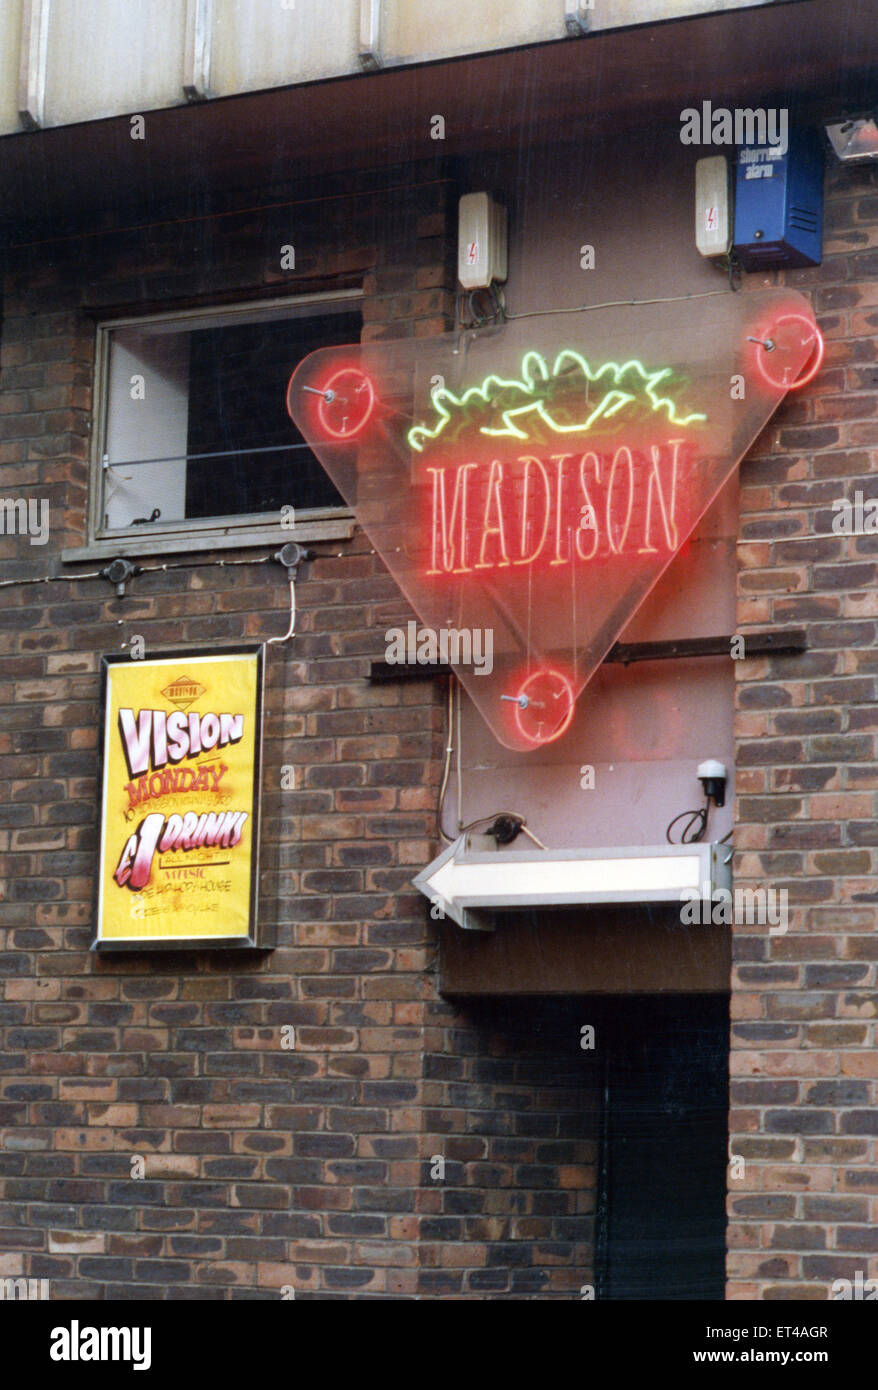 Madison nightclub in Newcastle, Tyne and Wear, circa 1990s. - Stock Image